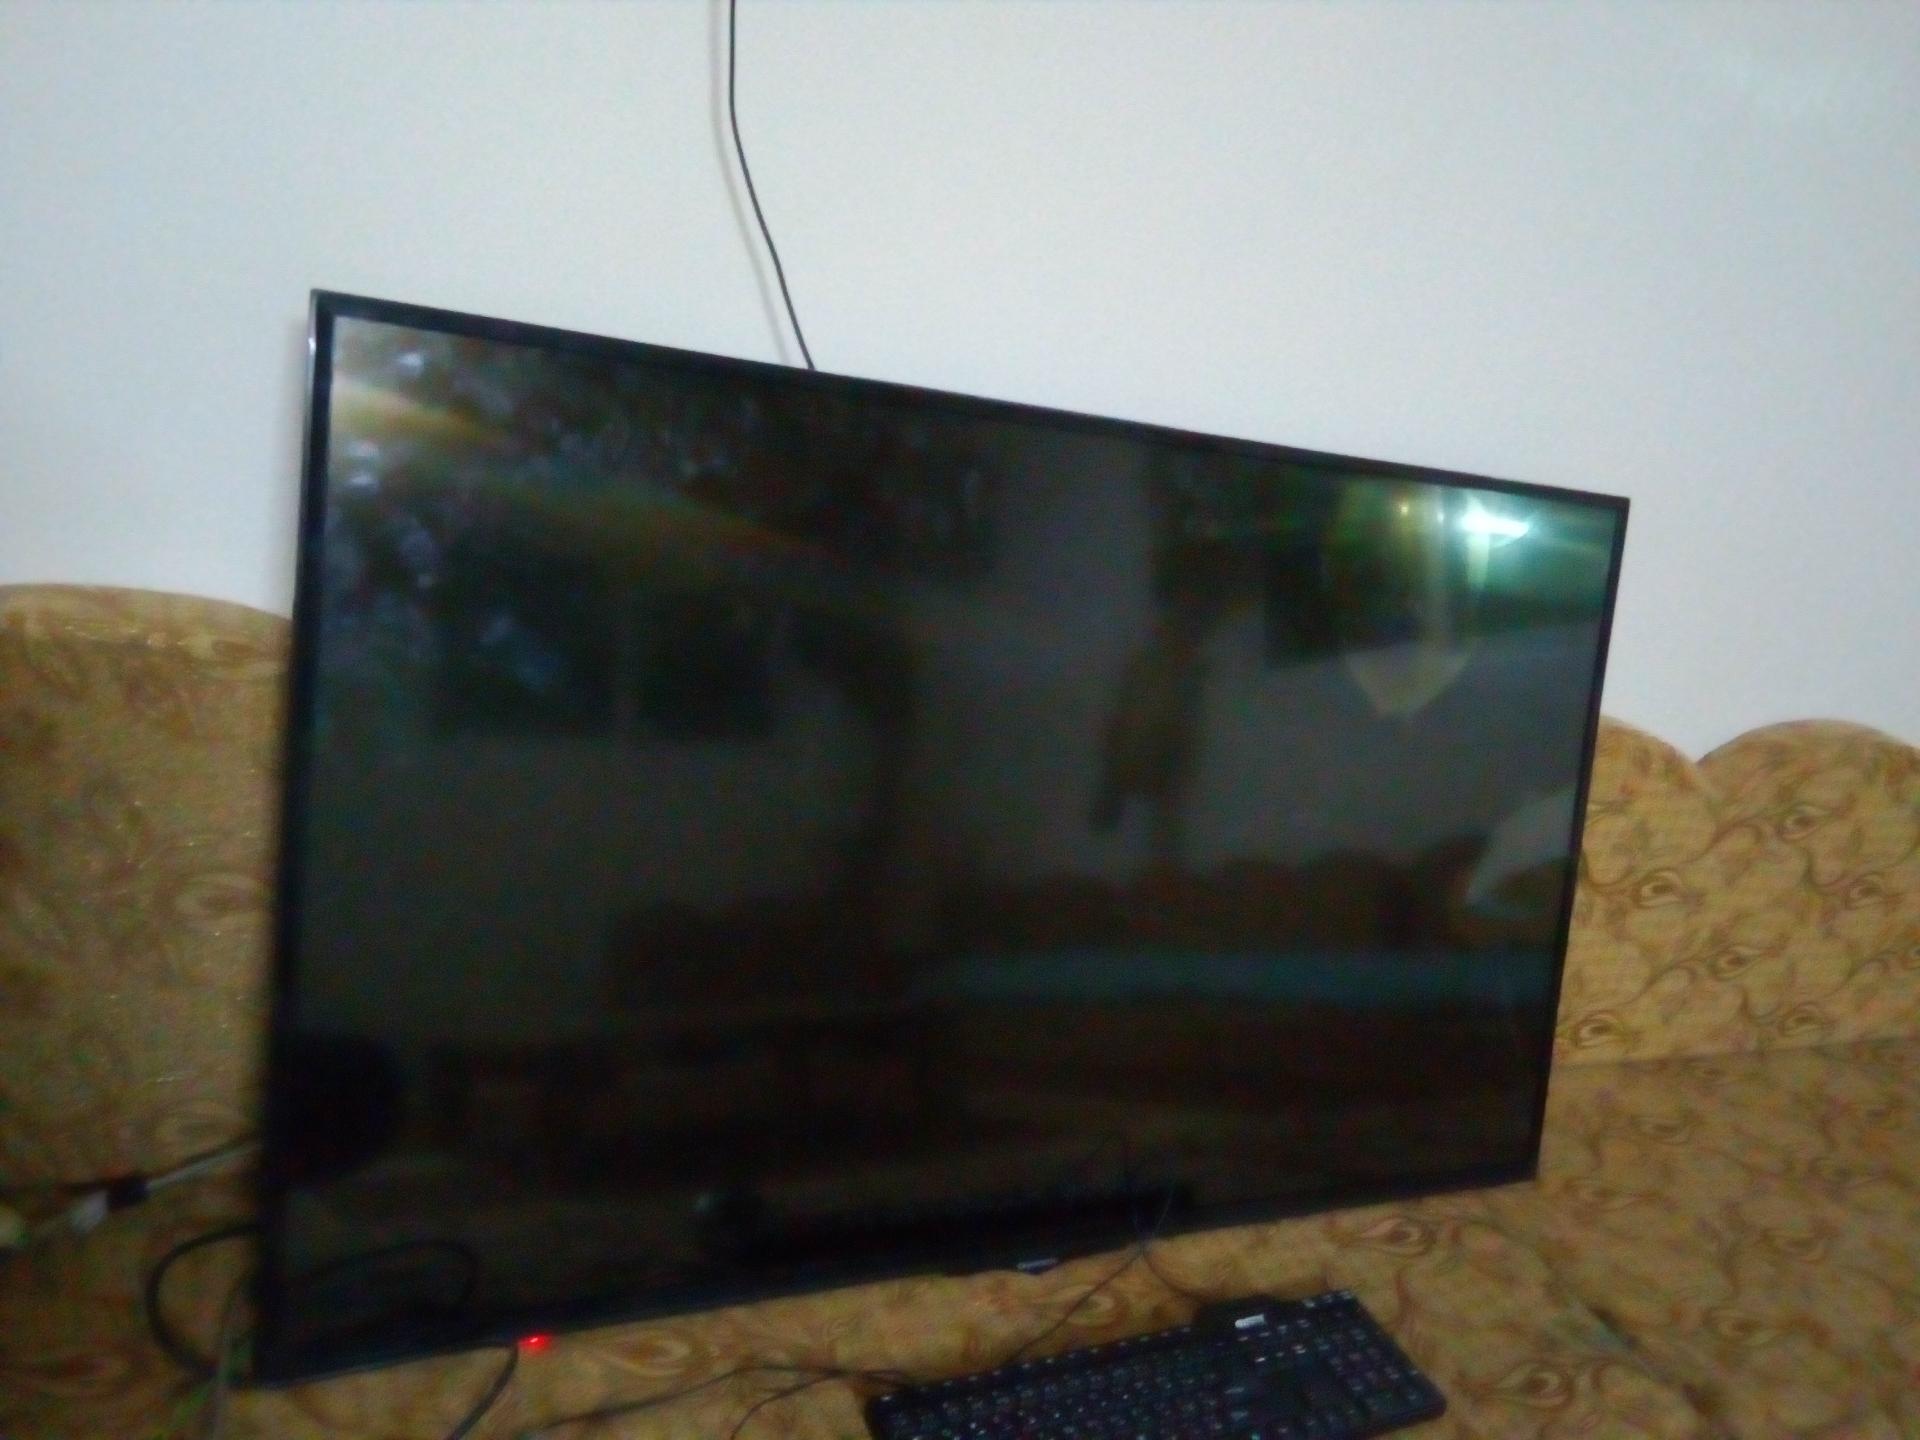 samsung monitor 27 insh شاشة مكتب سامسونج 27 بوصة-  شاشه مكسوره 50 بوصه للبيع...